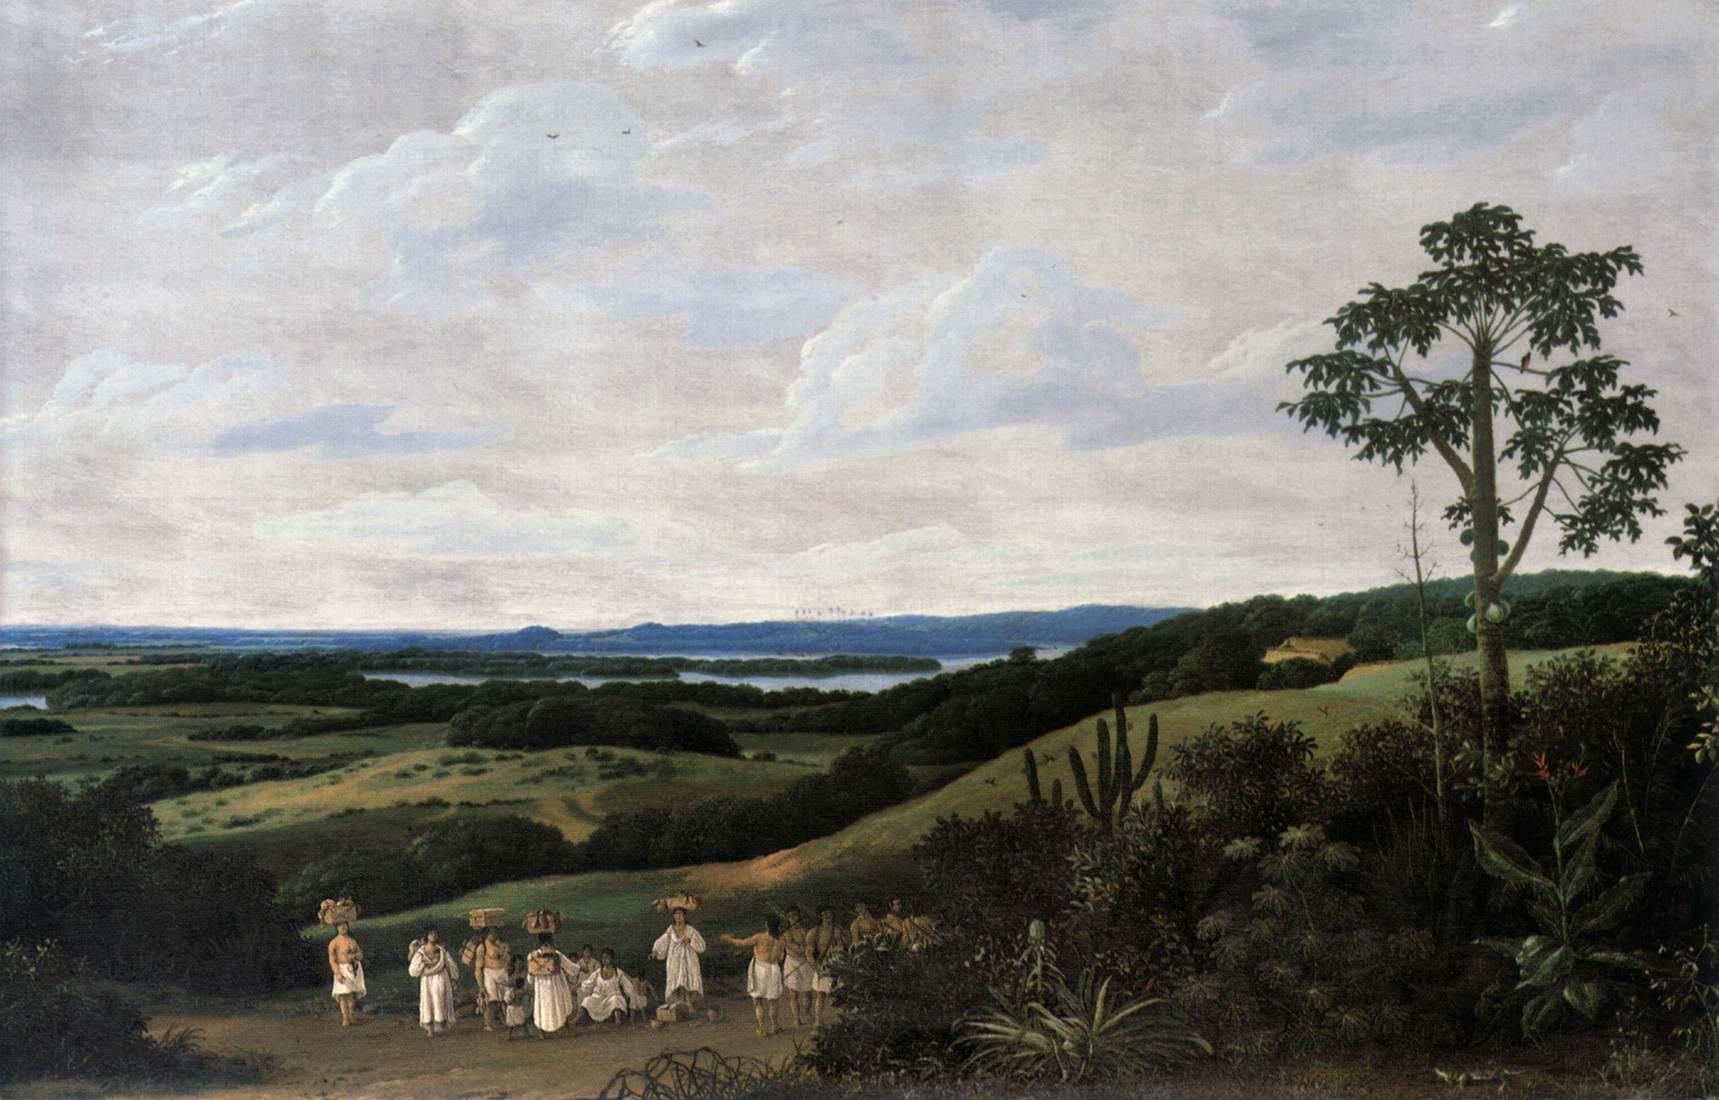 Brazilian Landscape by POST, Frans